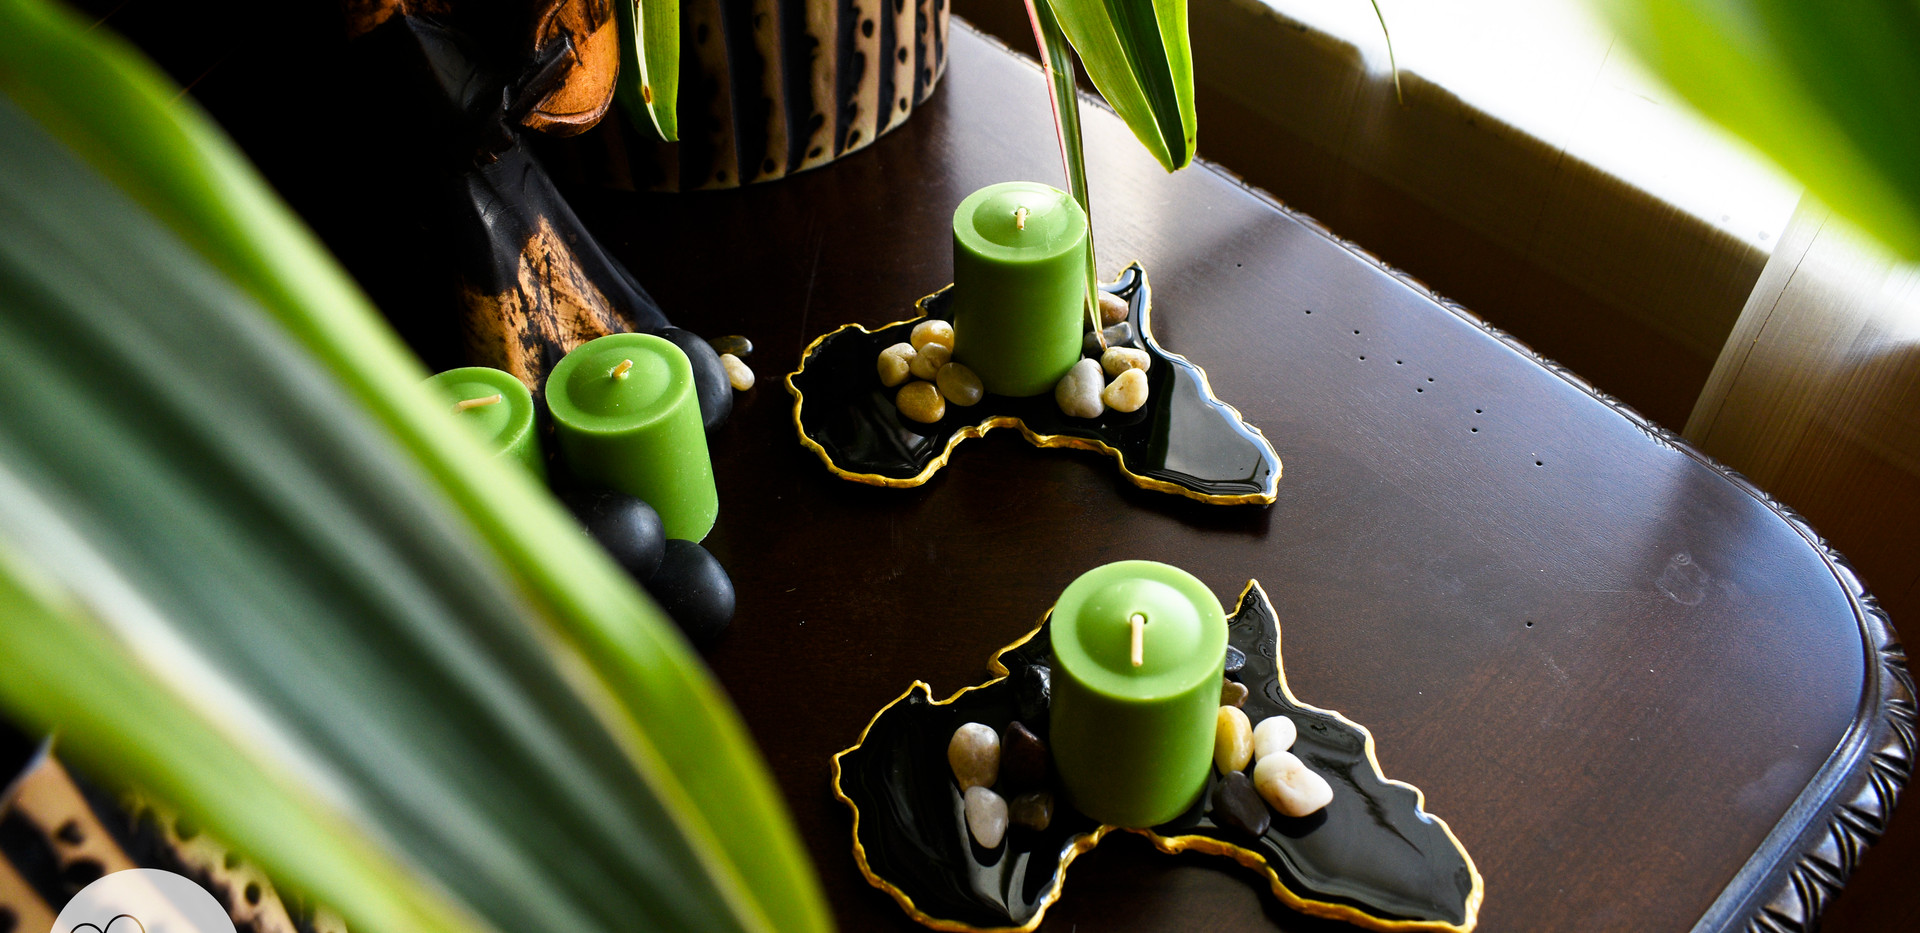 Rain Sky Home Black Coasters with Candle